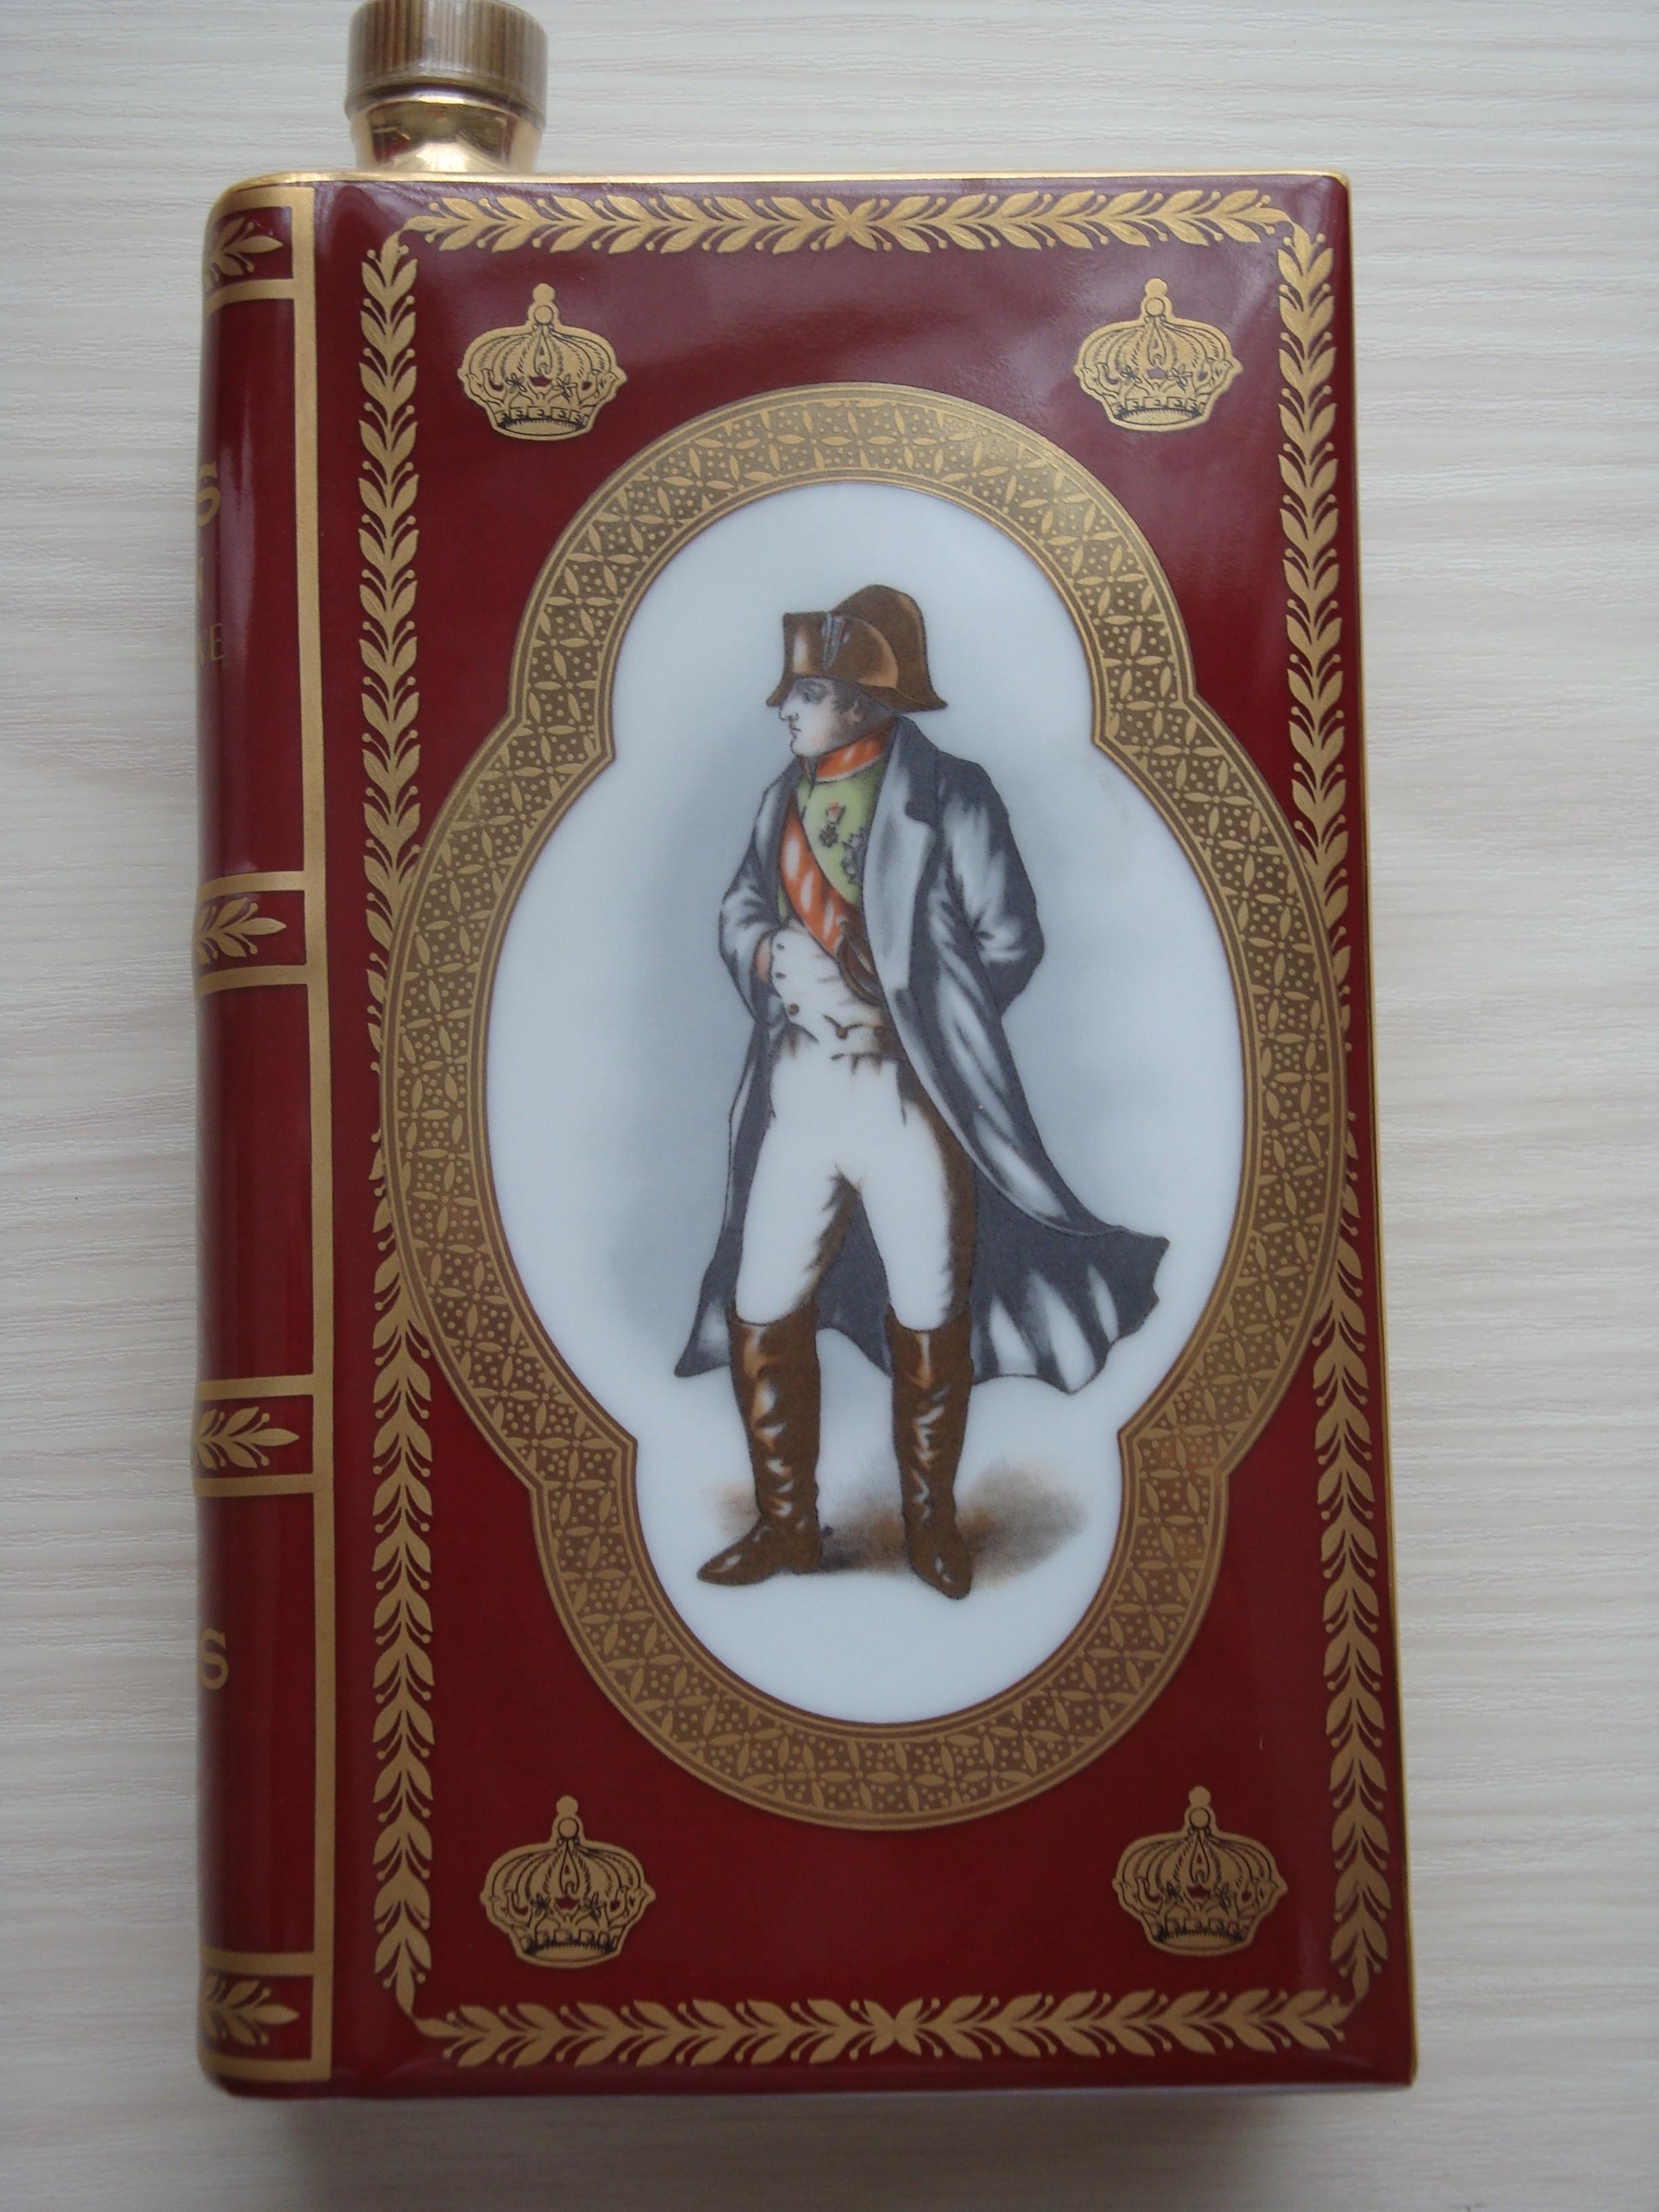 Camus Napoleon Vielle Reserve